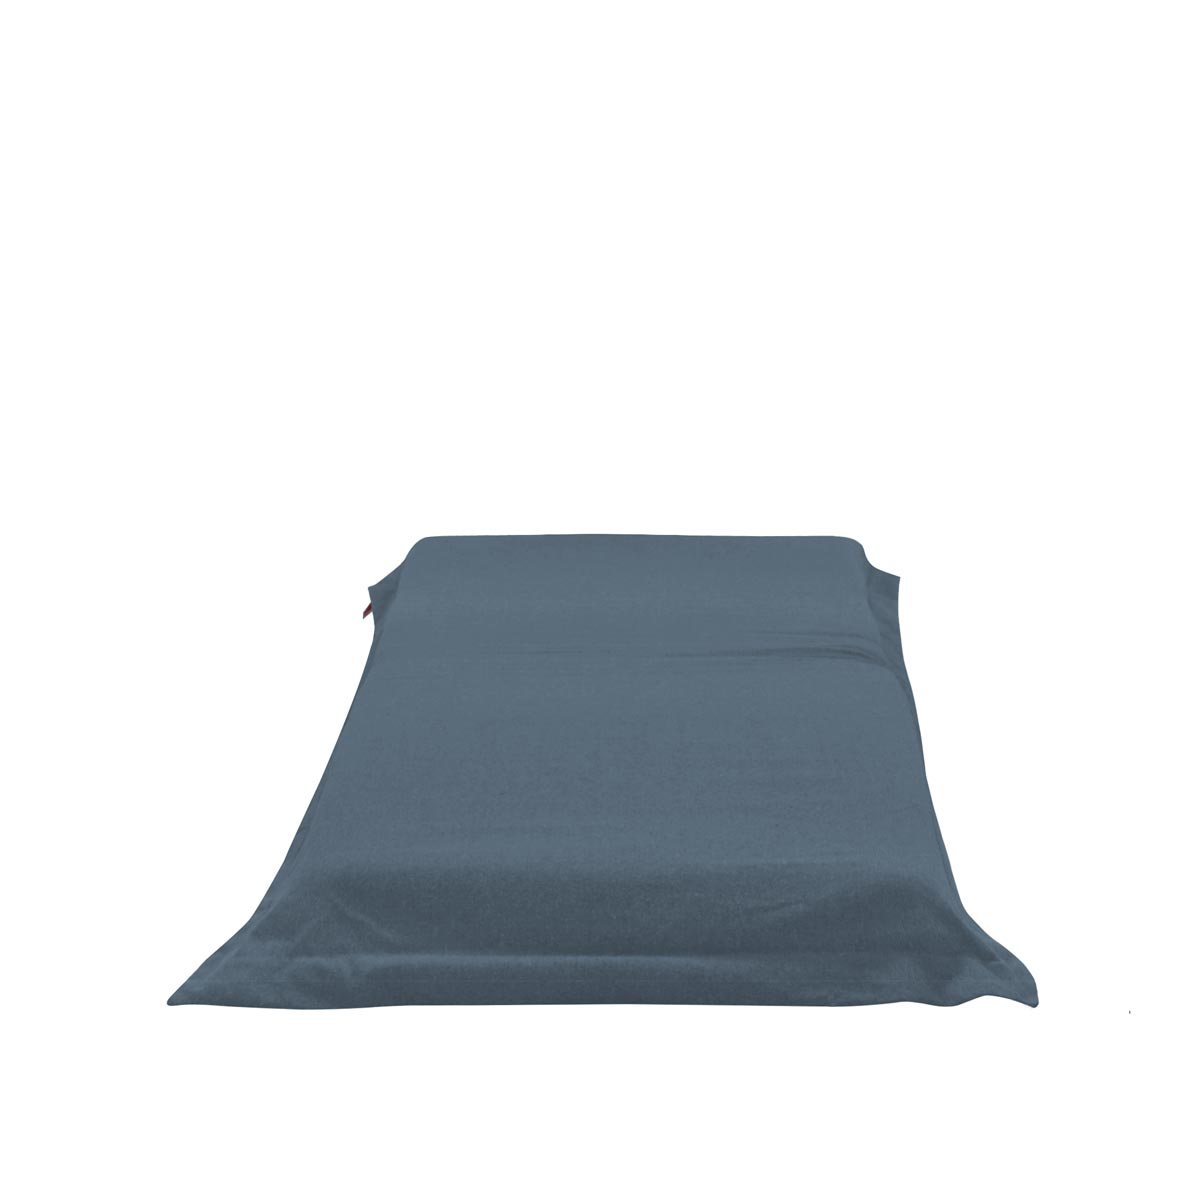 Pufe ClicClac Uno Lounge Tecido Ecolona Jeans Blue 01 01